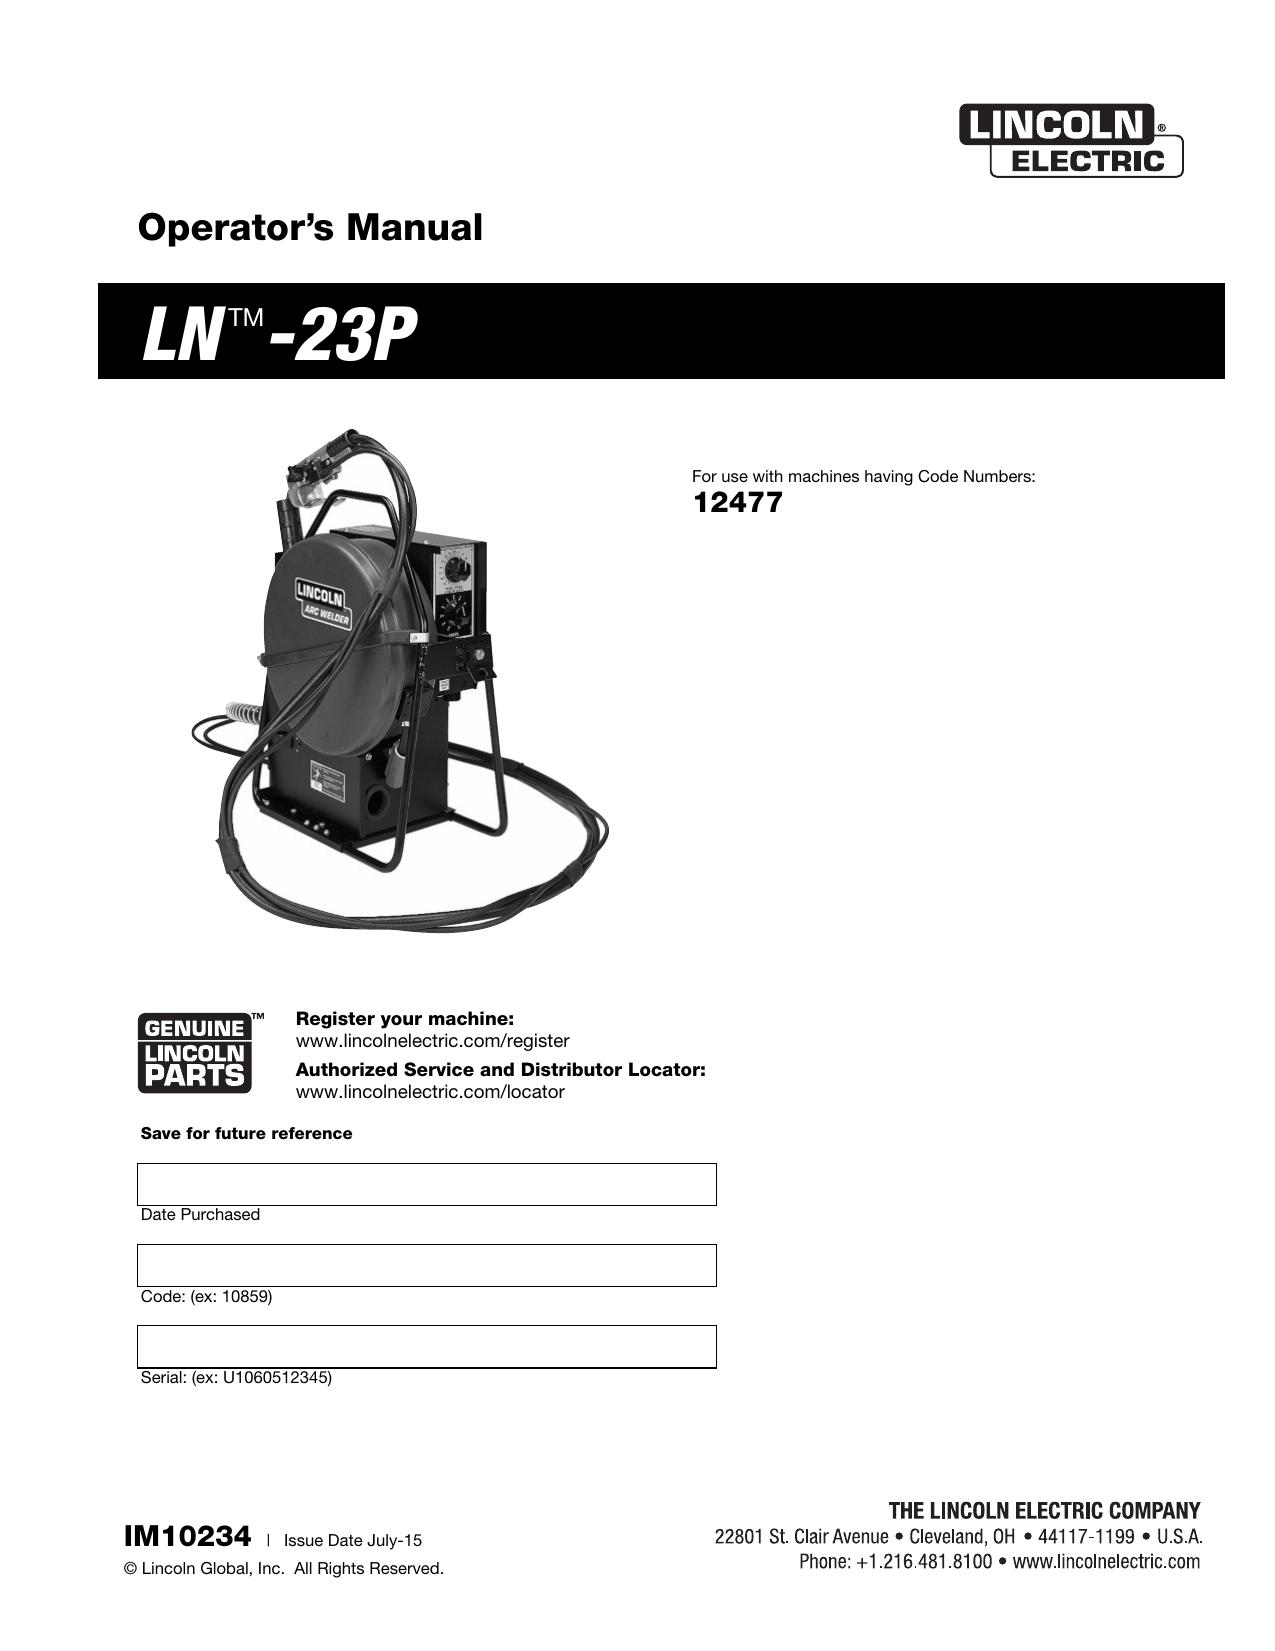 lincoln 305g wiring diagram lntm 23p lincoln electric manualzz  lntm 23p lincoln electric manualzz